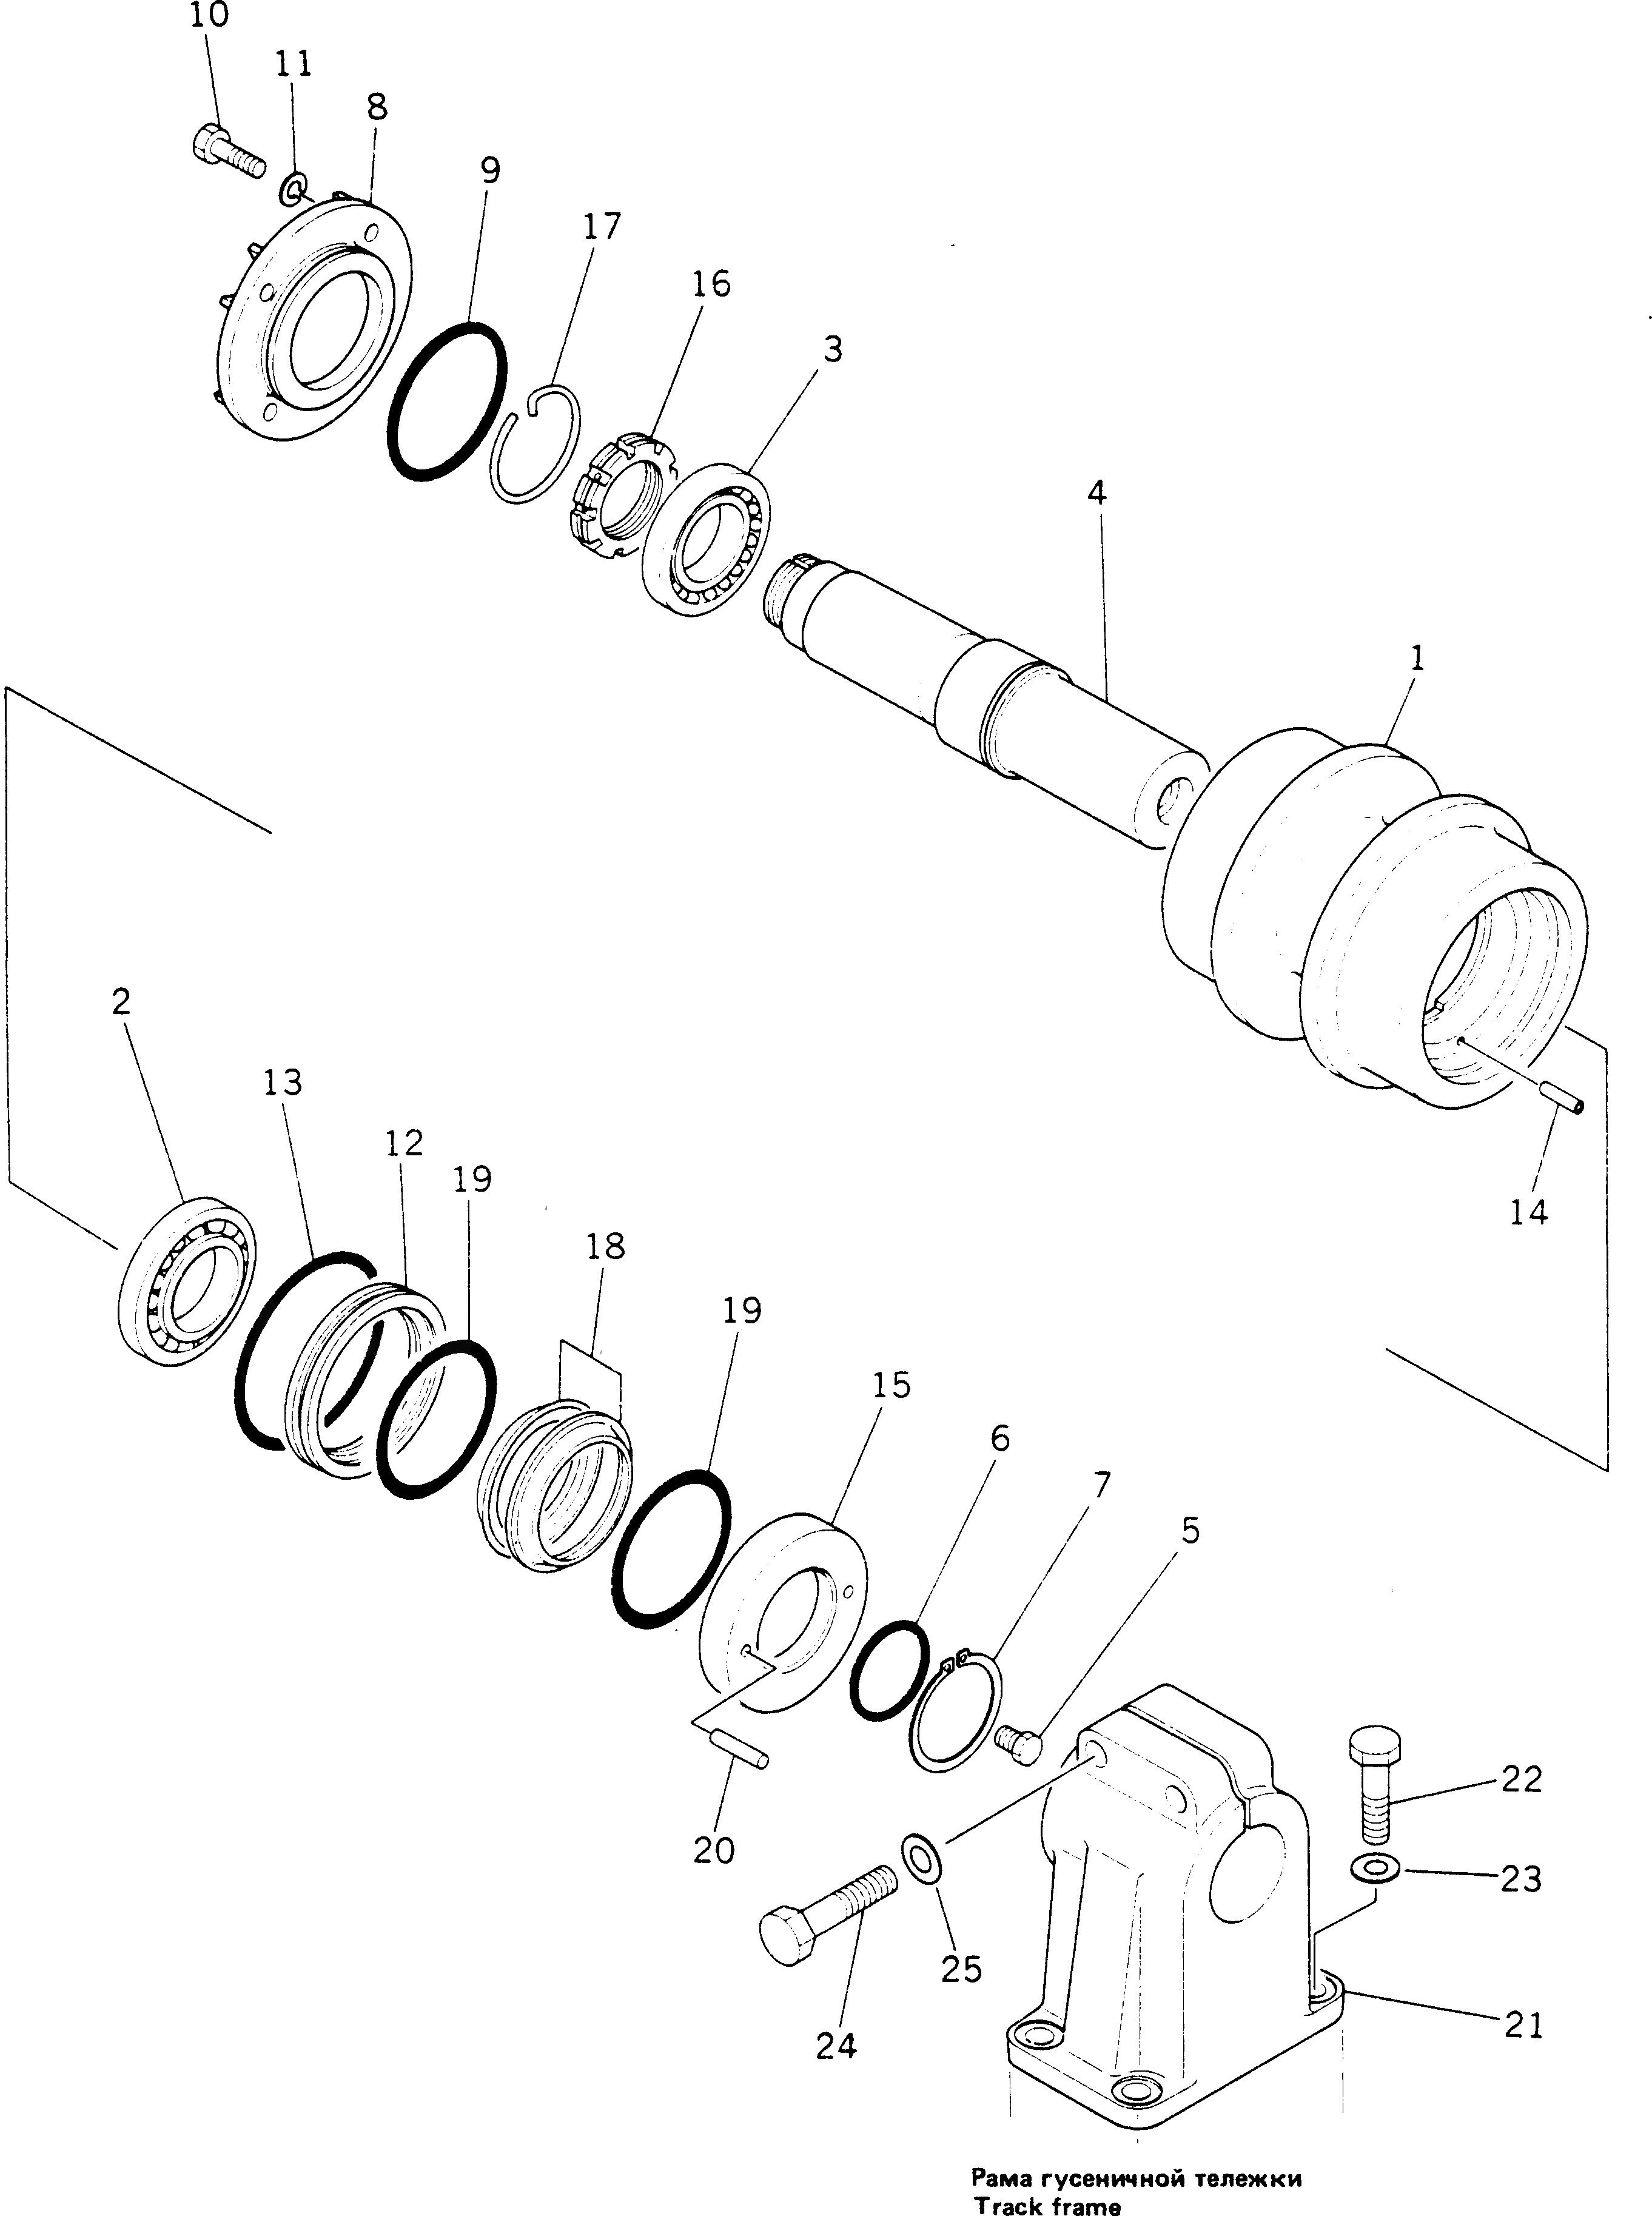 medium resolution of c36 wiring diagram wiring diagramc36 wiring diagram wiring diagram repair guidesc36 wiring diagram wiring diagram usedc36